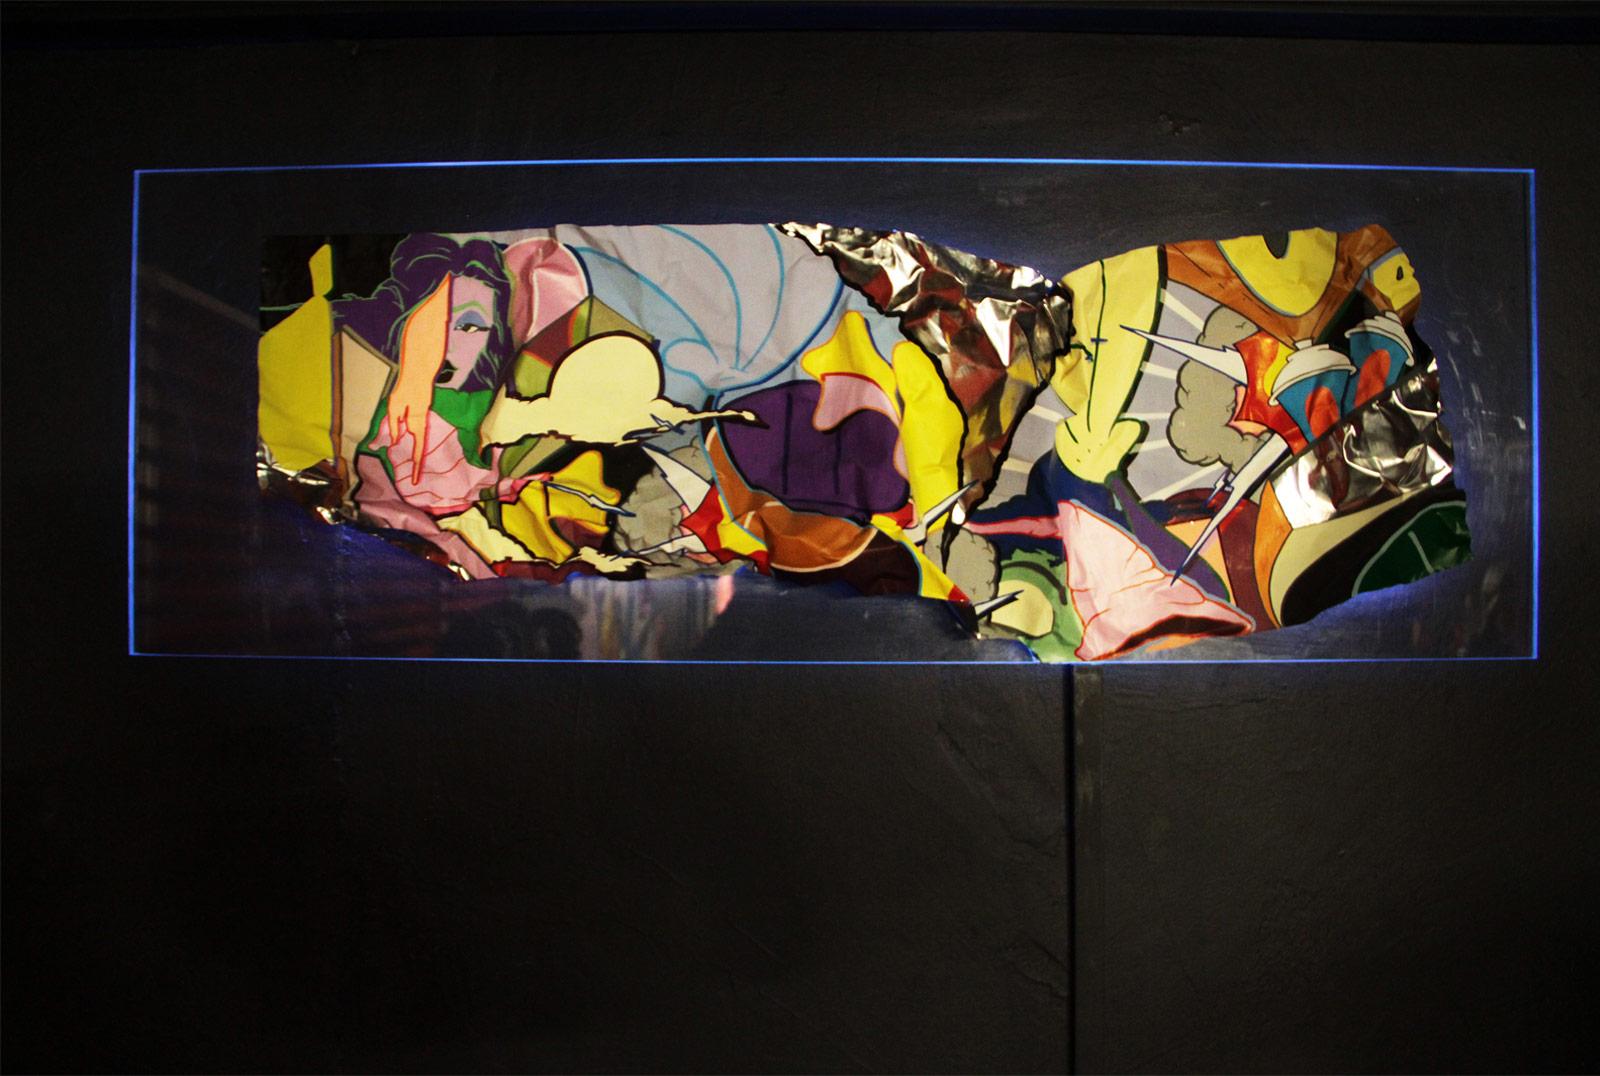 Leinwand Art In The Dark